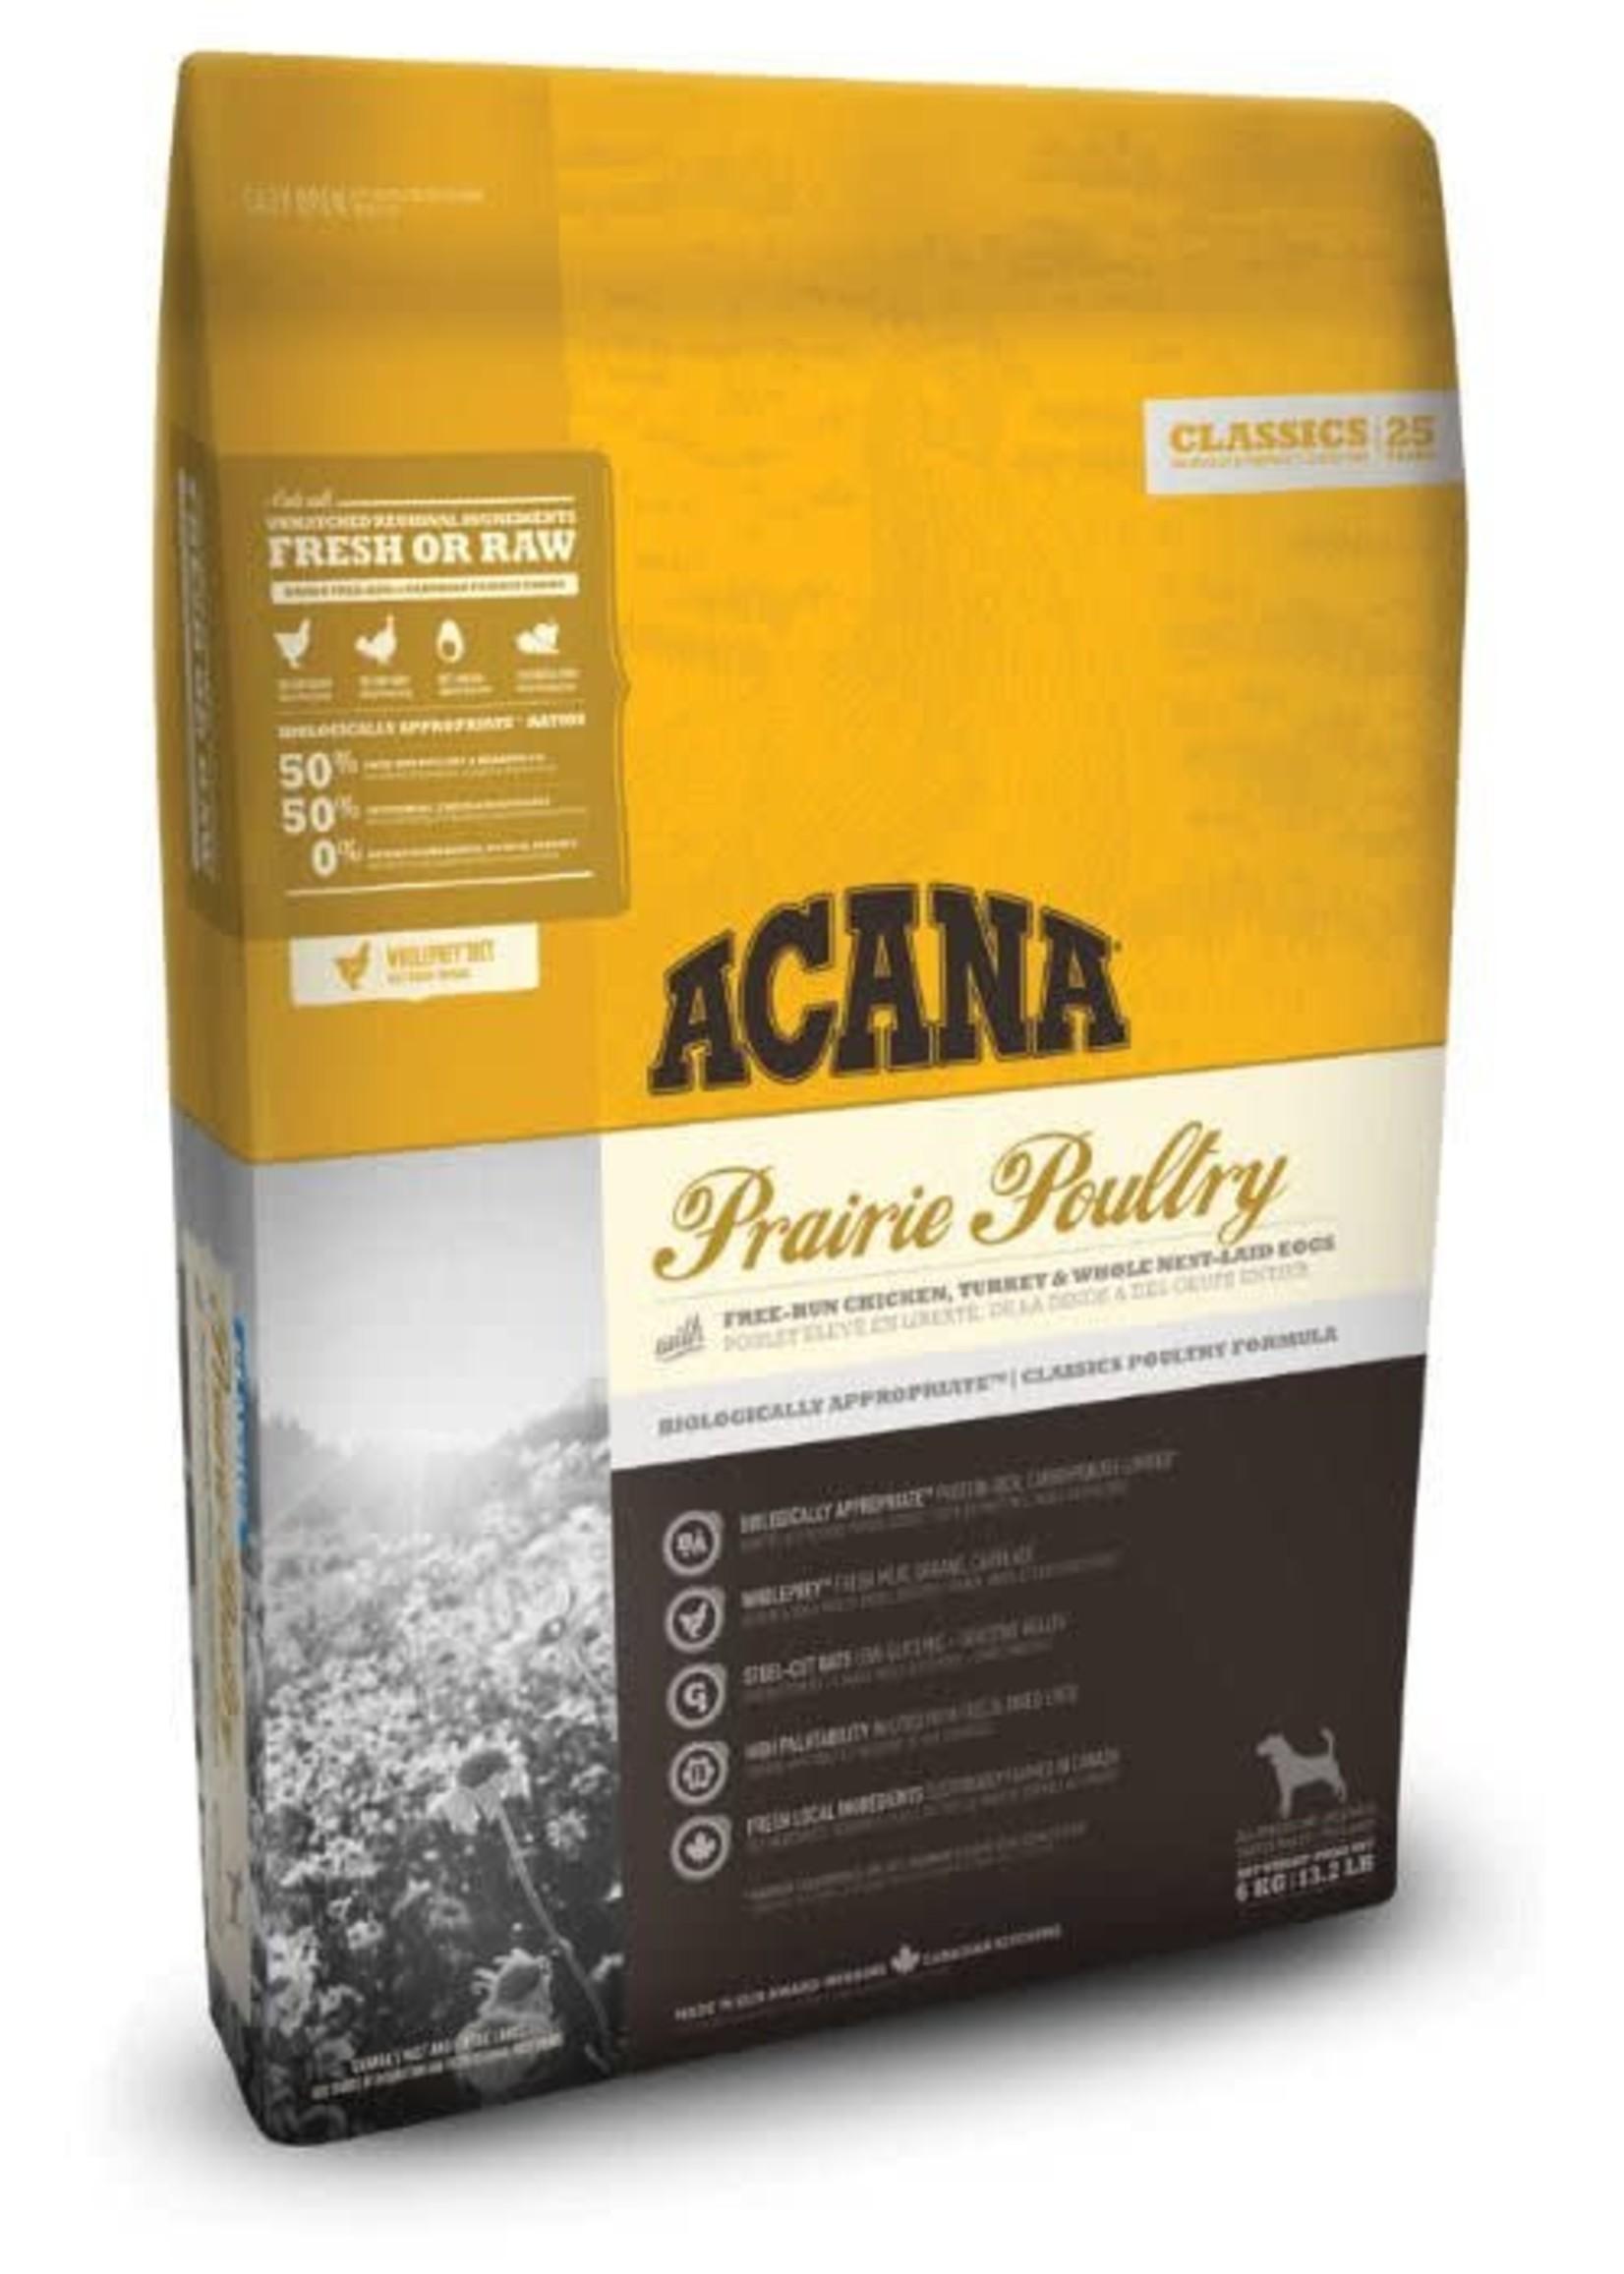 Acana® Acana Classics Prairie Poultry